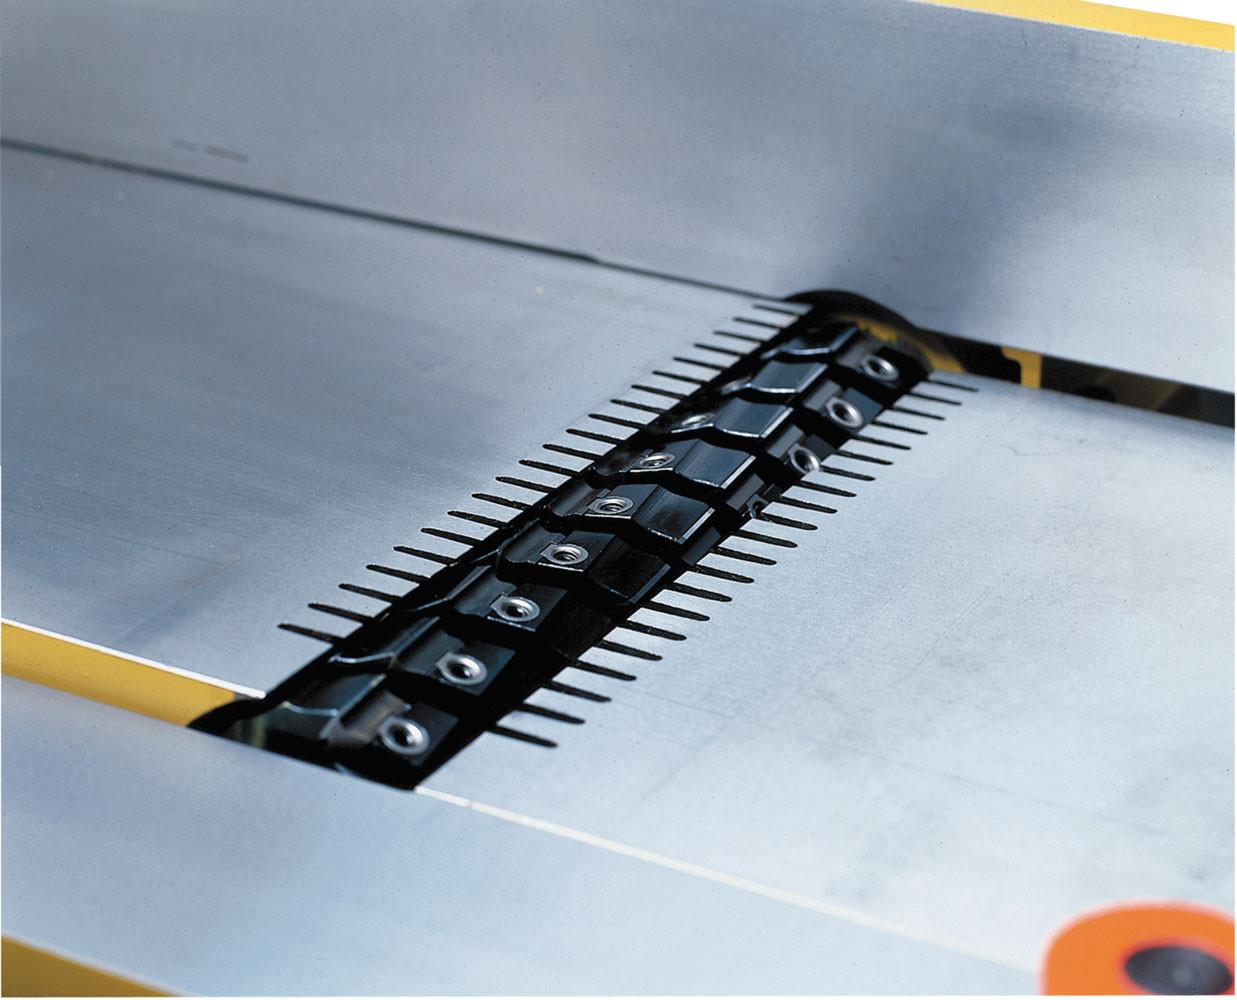 PJ-1696 HH Фугувальний верстат Powermatic з ножовим валом «helical» фото 7